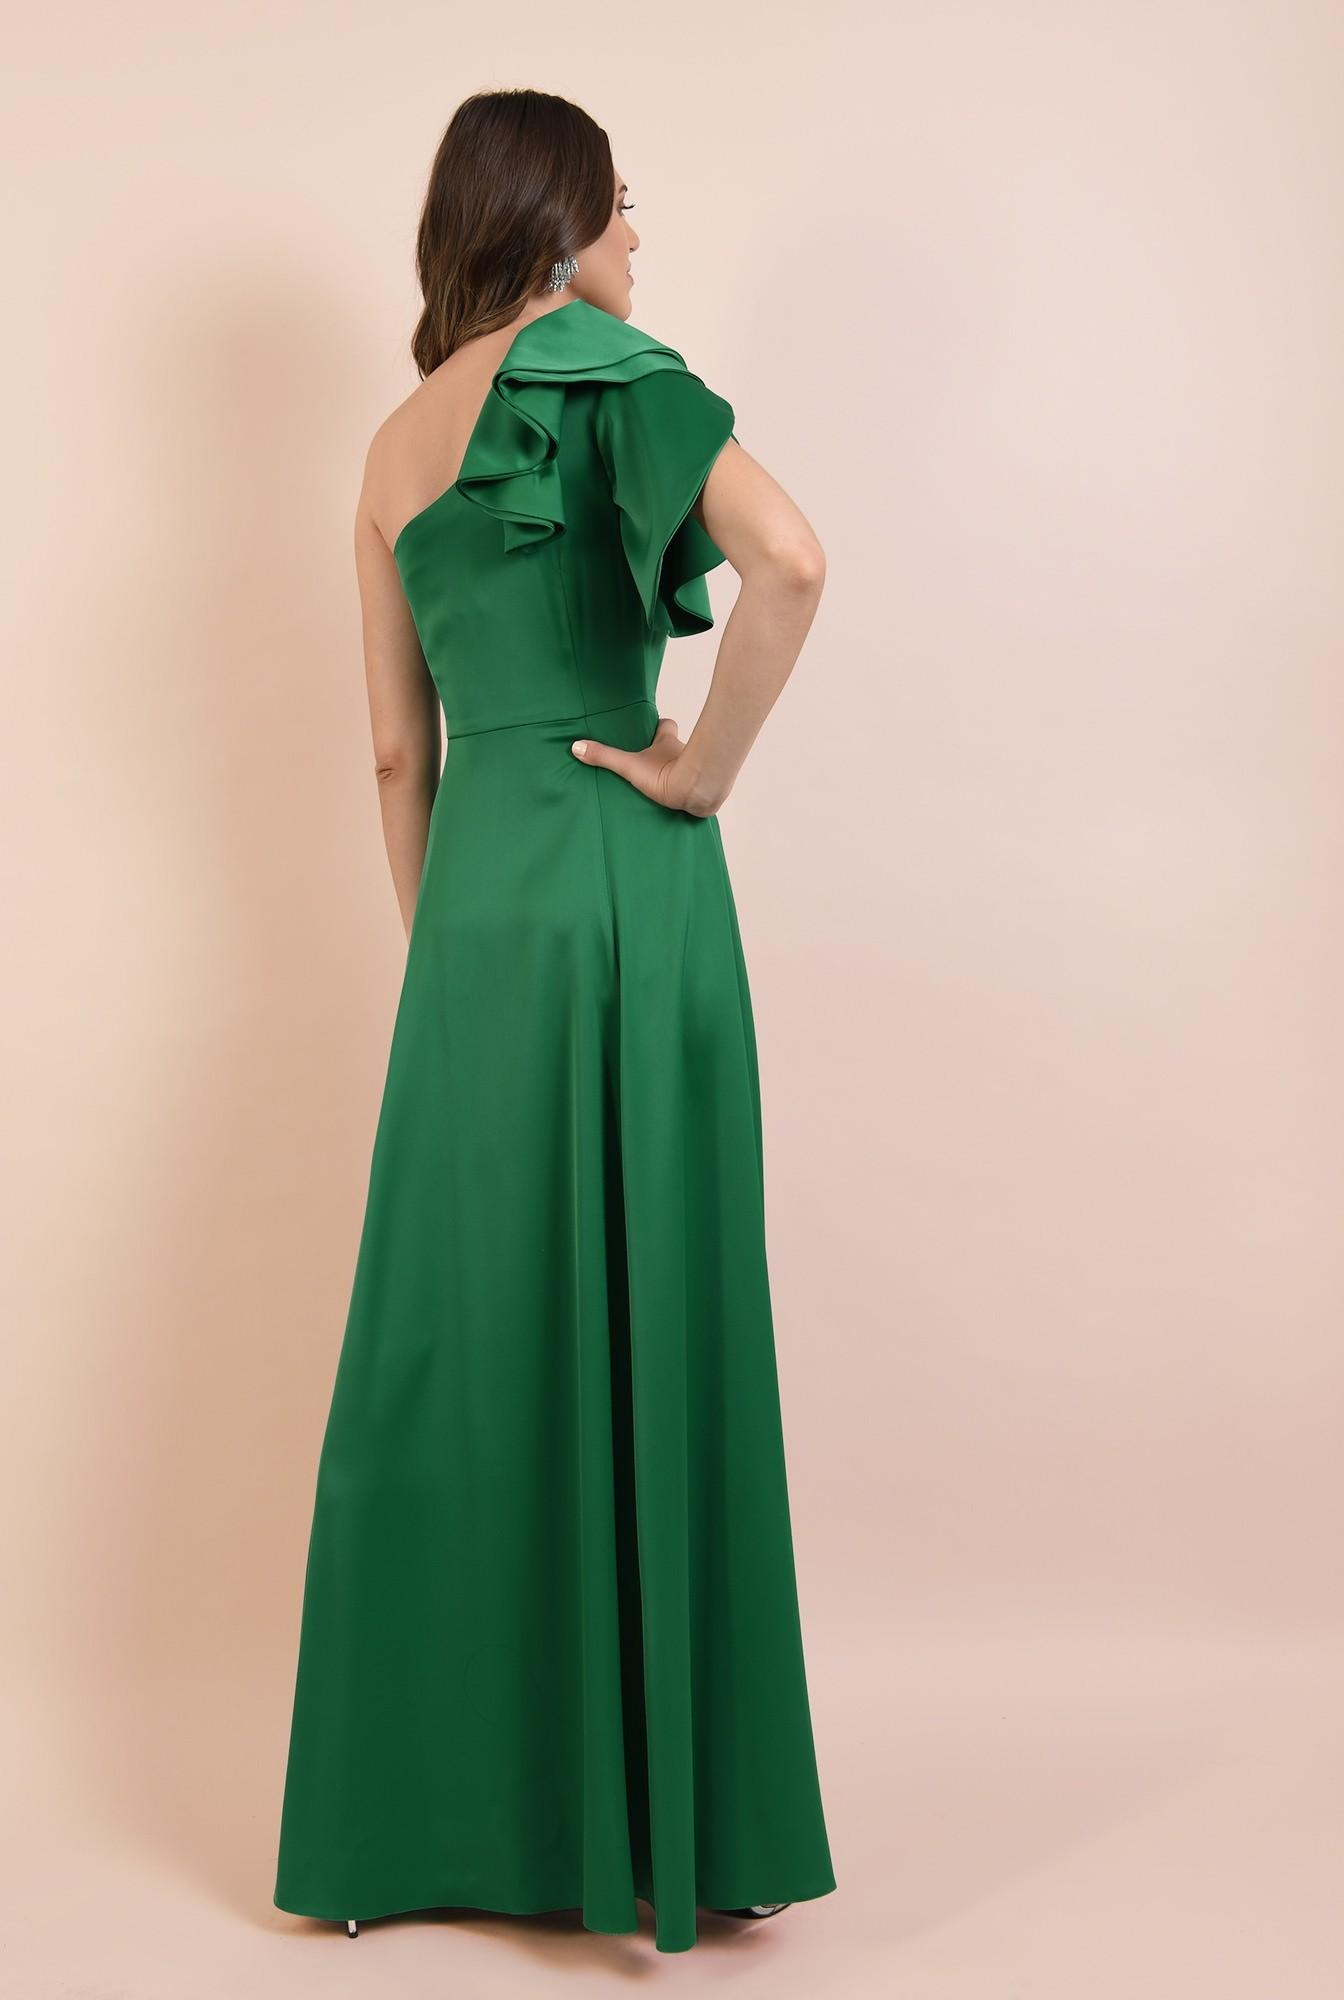 1 - rochie de ocazie, lunga, verde, cu crapeu, cu volane la umar, maneca lalea